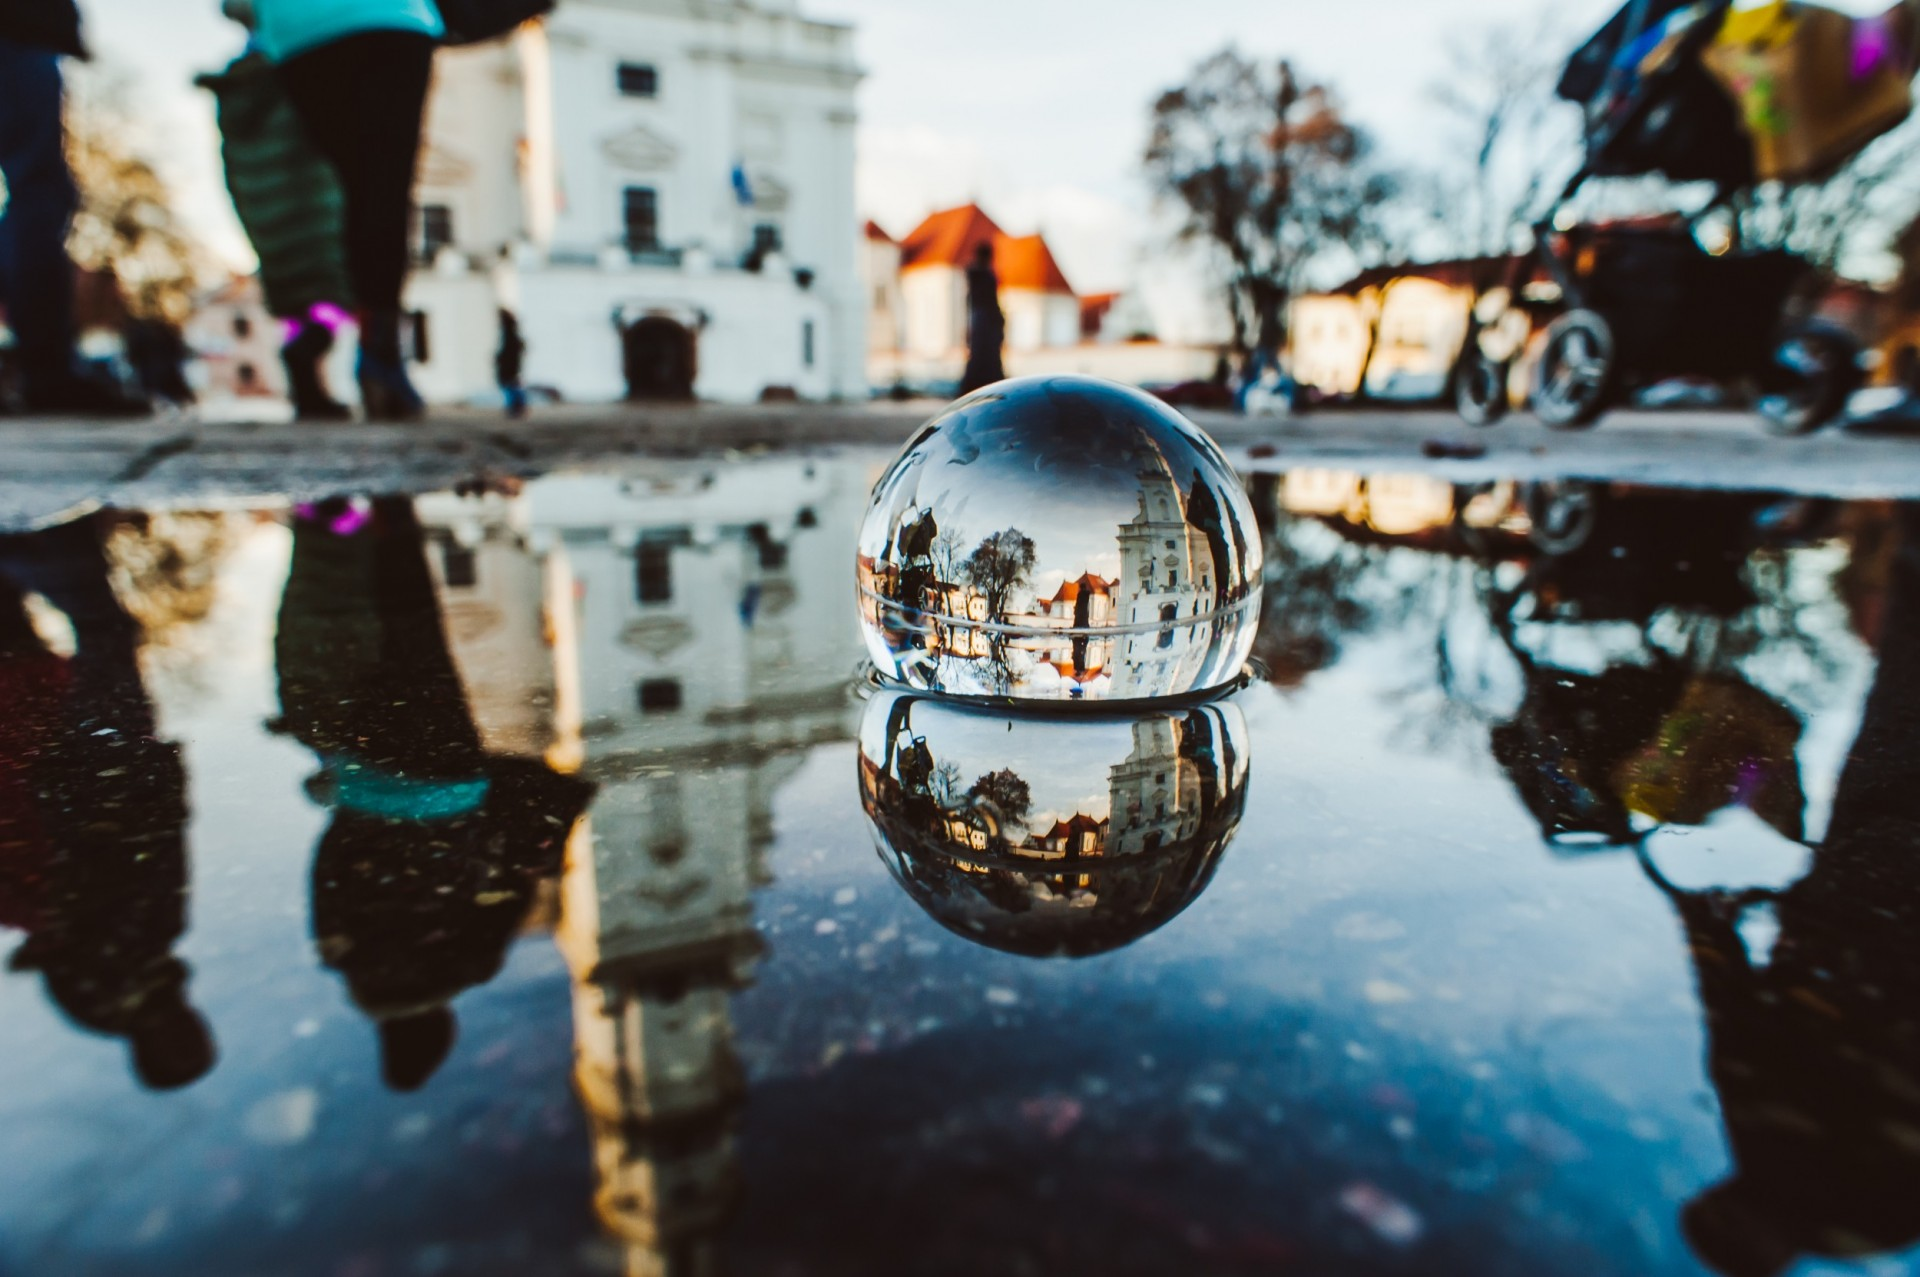 Nikon Glass Ball Project